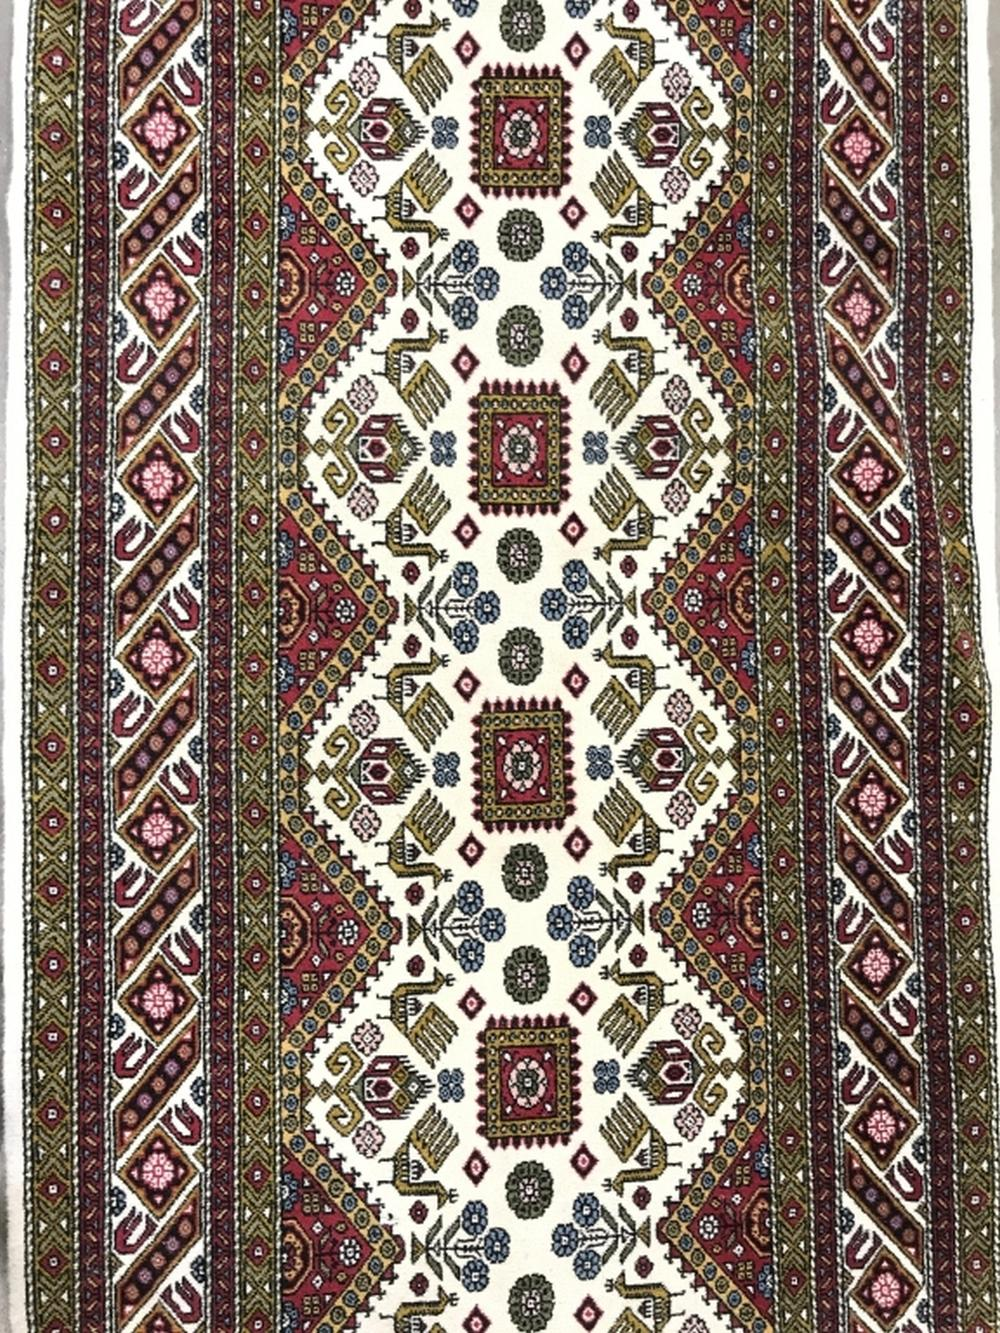 AZARBAYCAN Signed Handmade Wool Runner